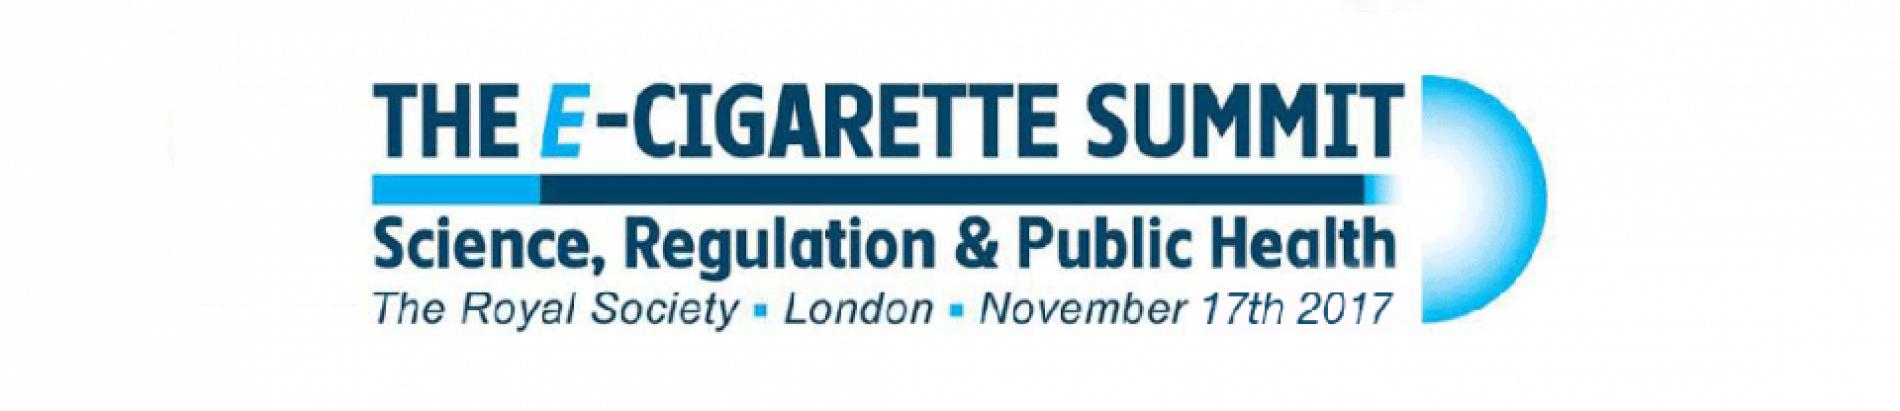 Venerdì 17 Novembre a Londra torna l'E-cigarette Summit